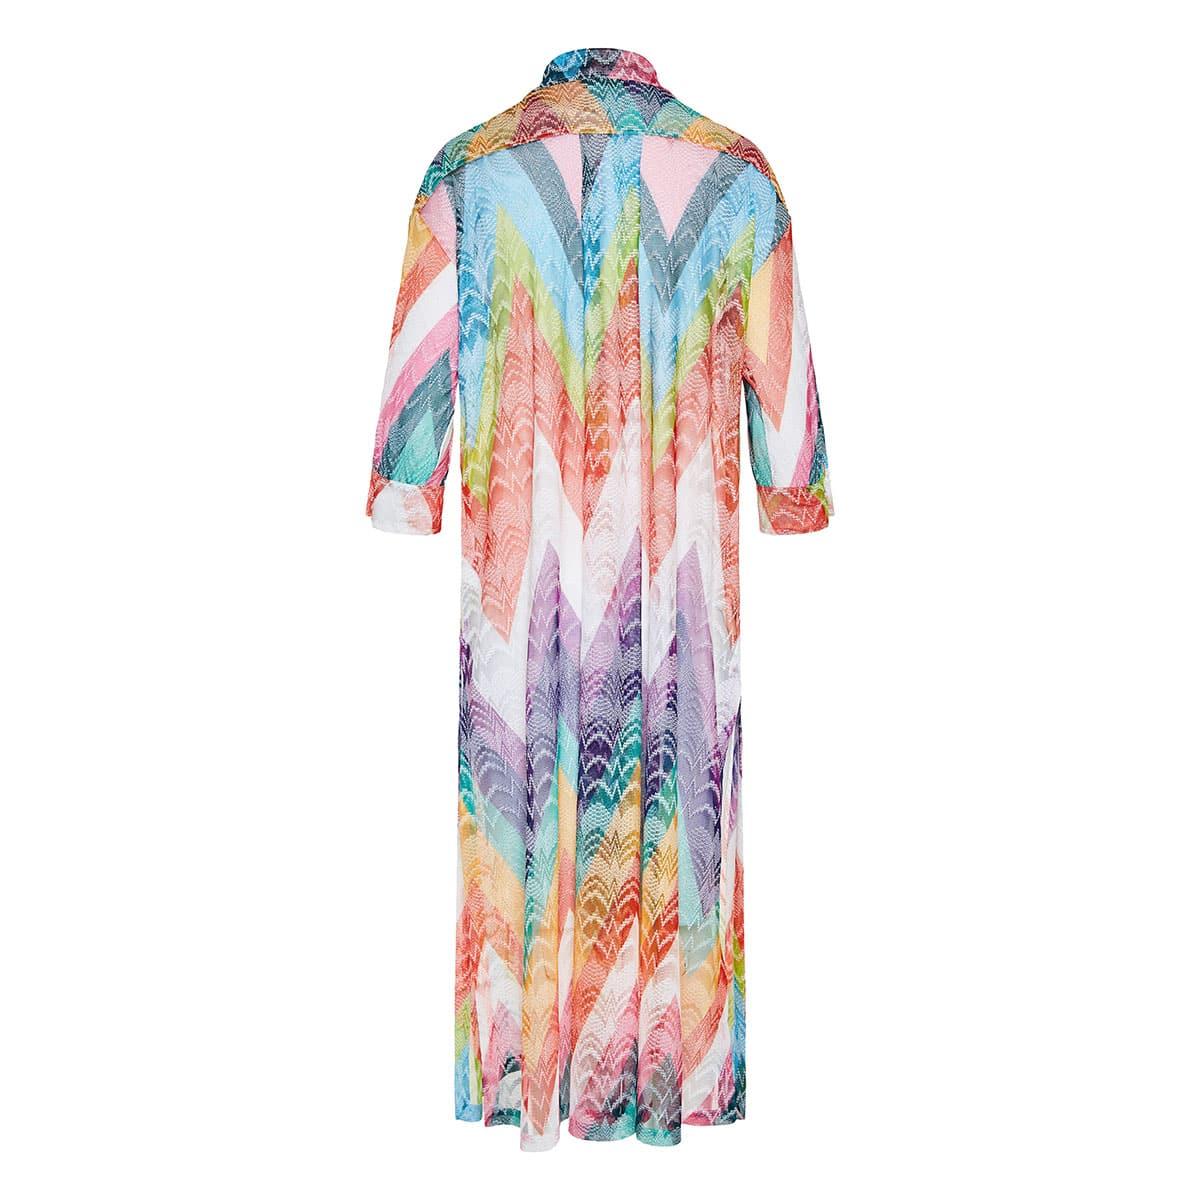 Chevron long knitted beach dress